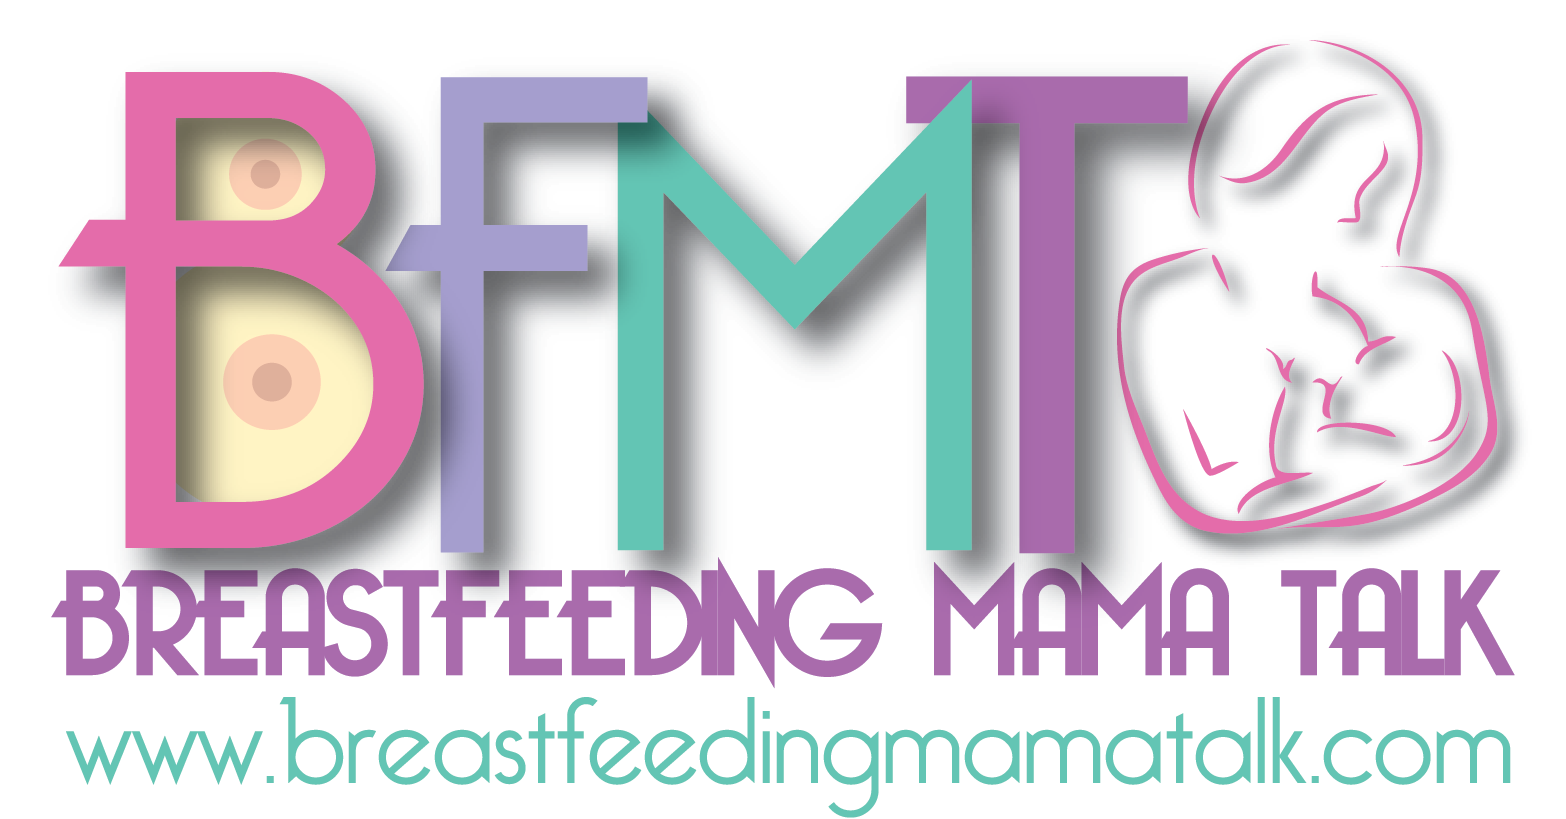 The BFMT Mission Statement